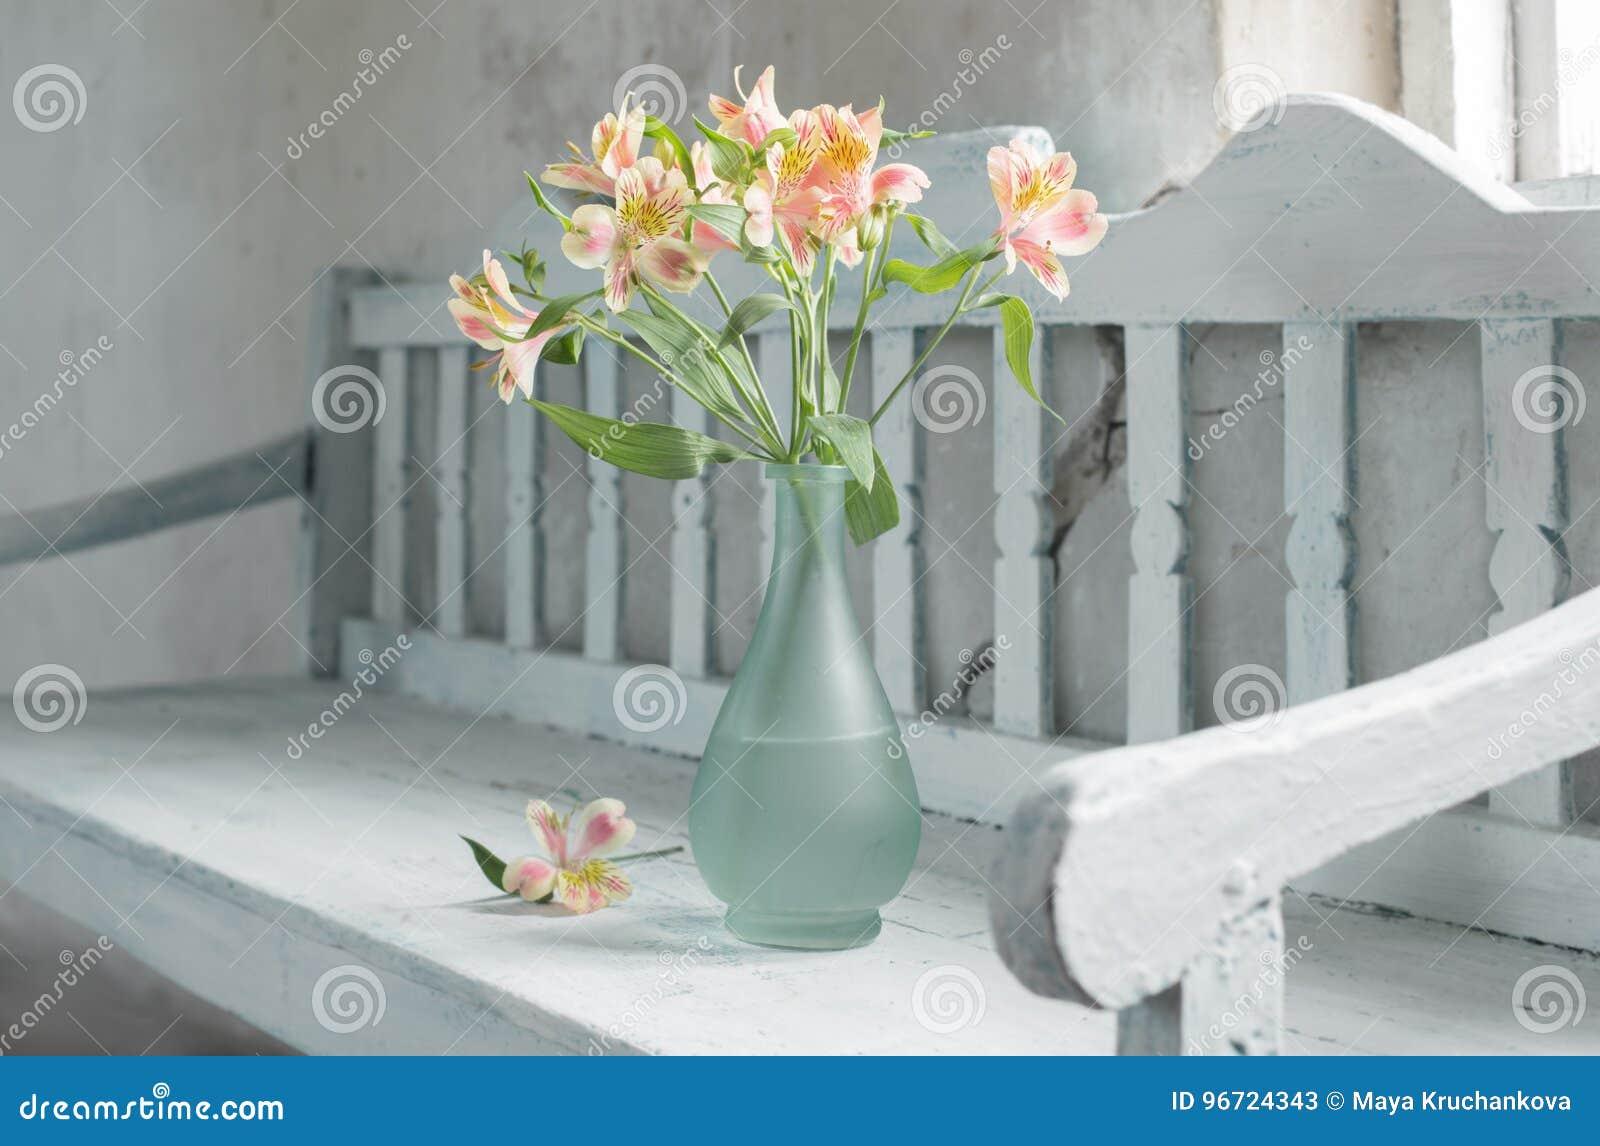 Alstroemeria in vase on old wooden bench